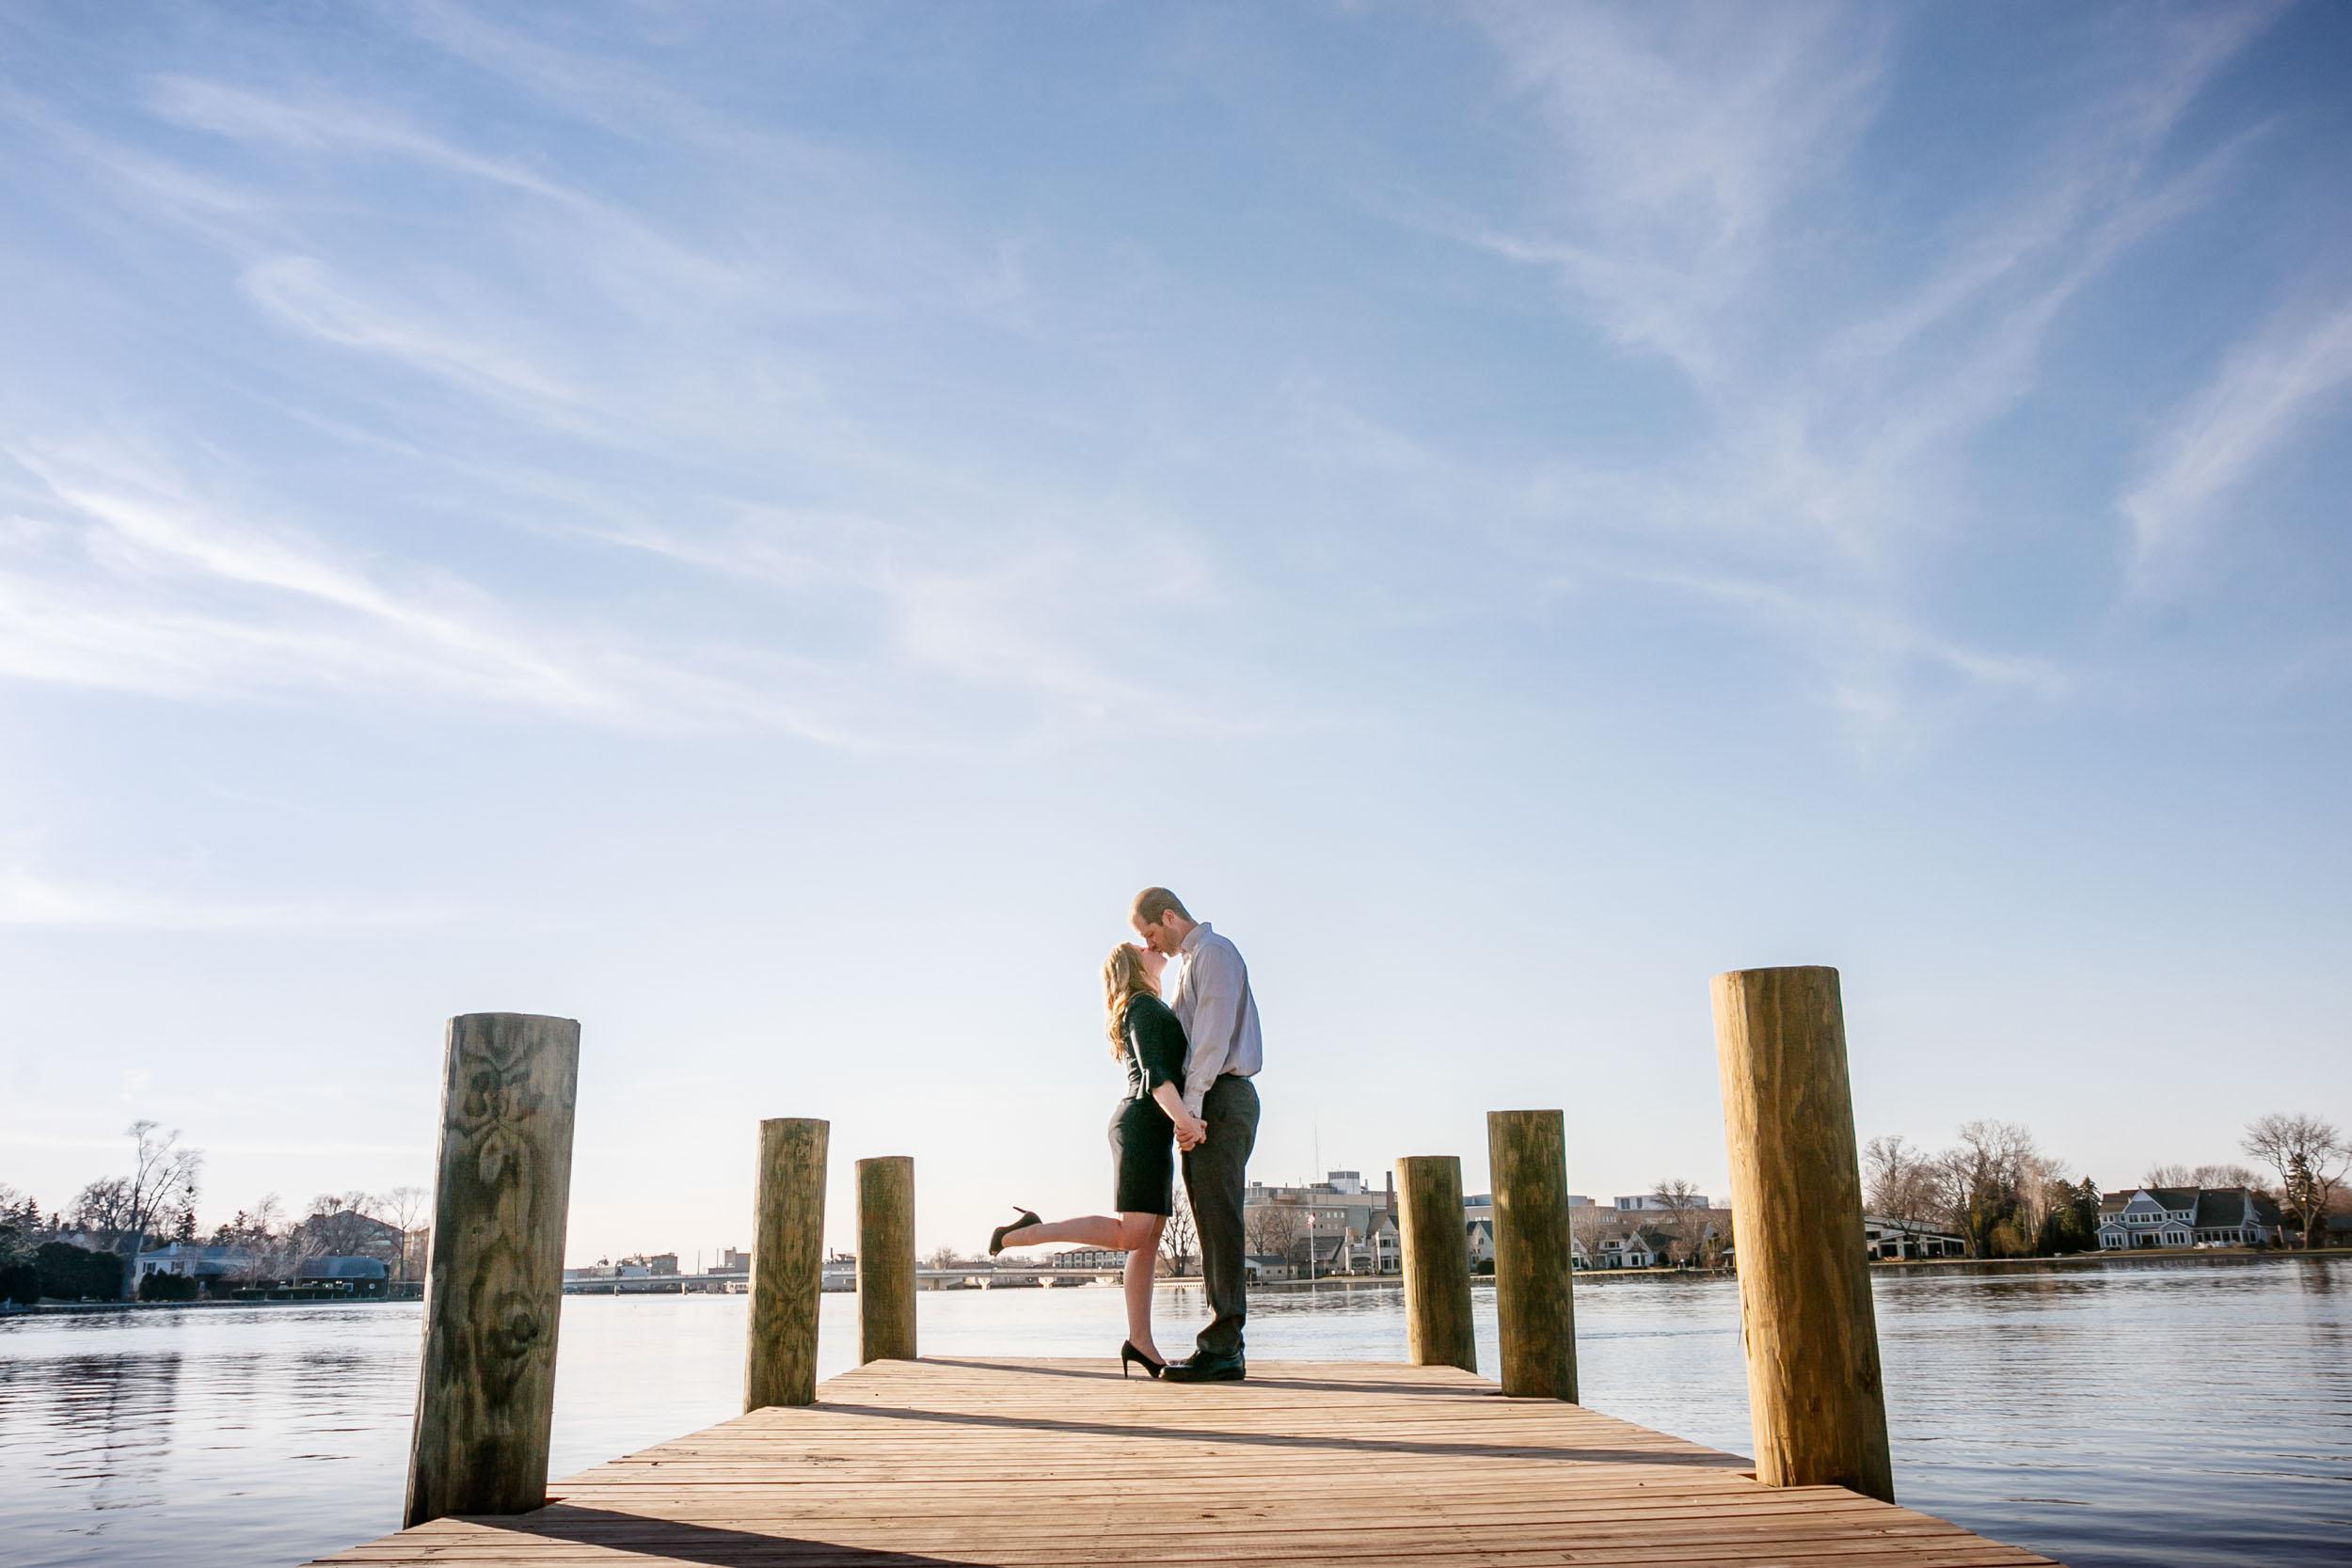 fall-engagement-photos-riverside-park-neenah-wisconsin--adam-shea-photography-green-bay-appleton-neenah-photographer-40.jpg